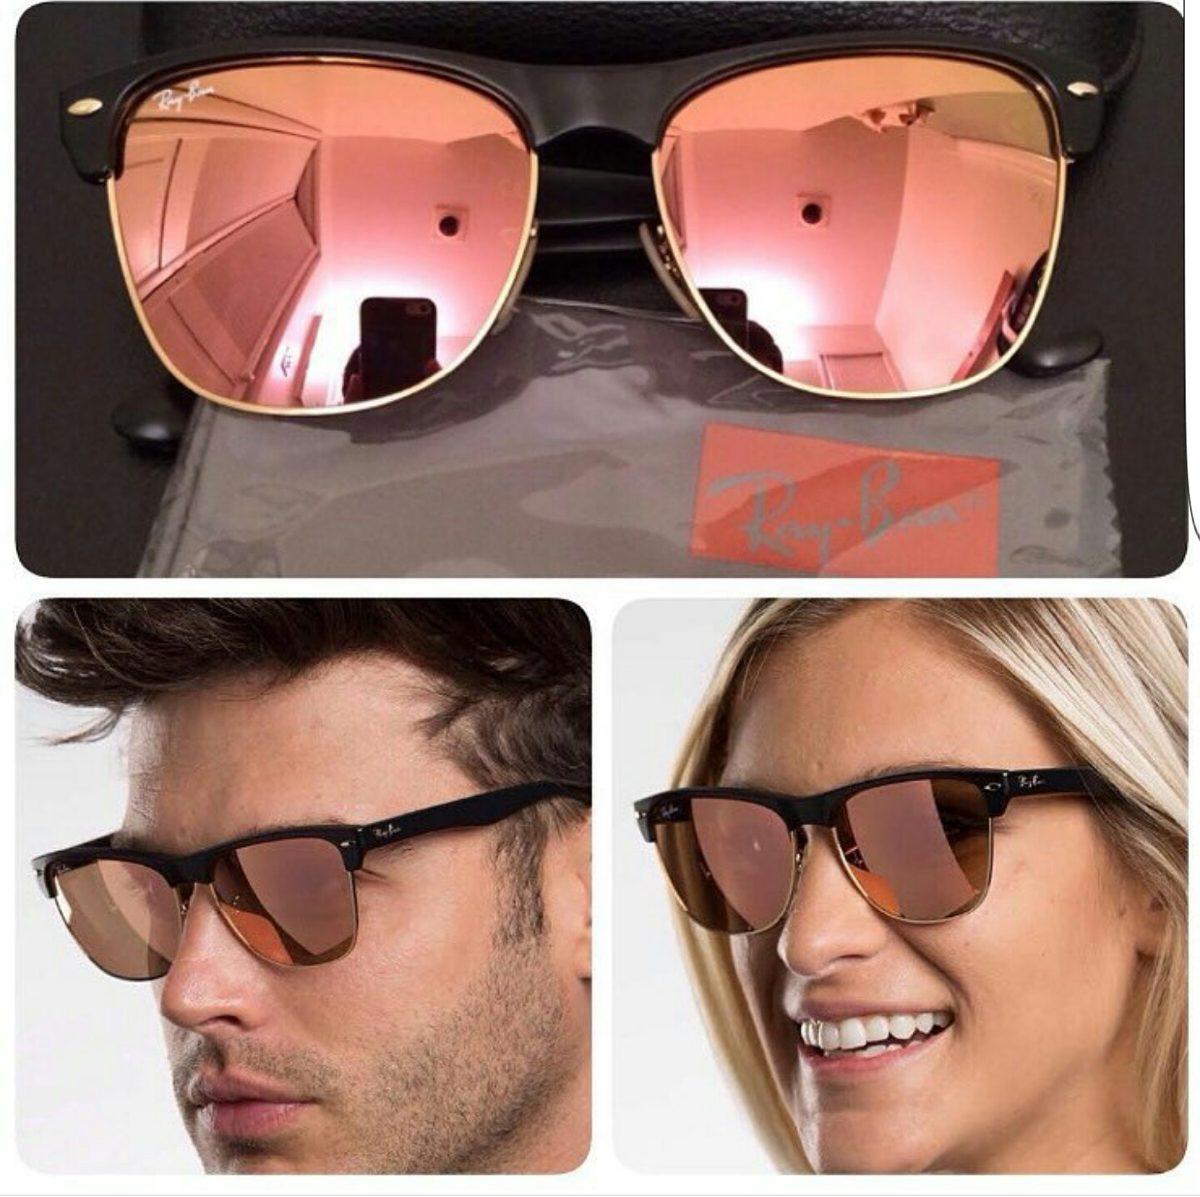 e0acfc6a3 óculos ray ban clubmaster oversized rosa feminino masculino. Carregando  zoom.